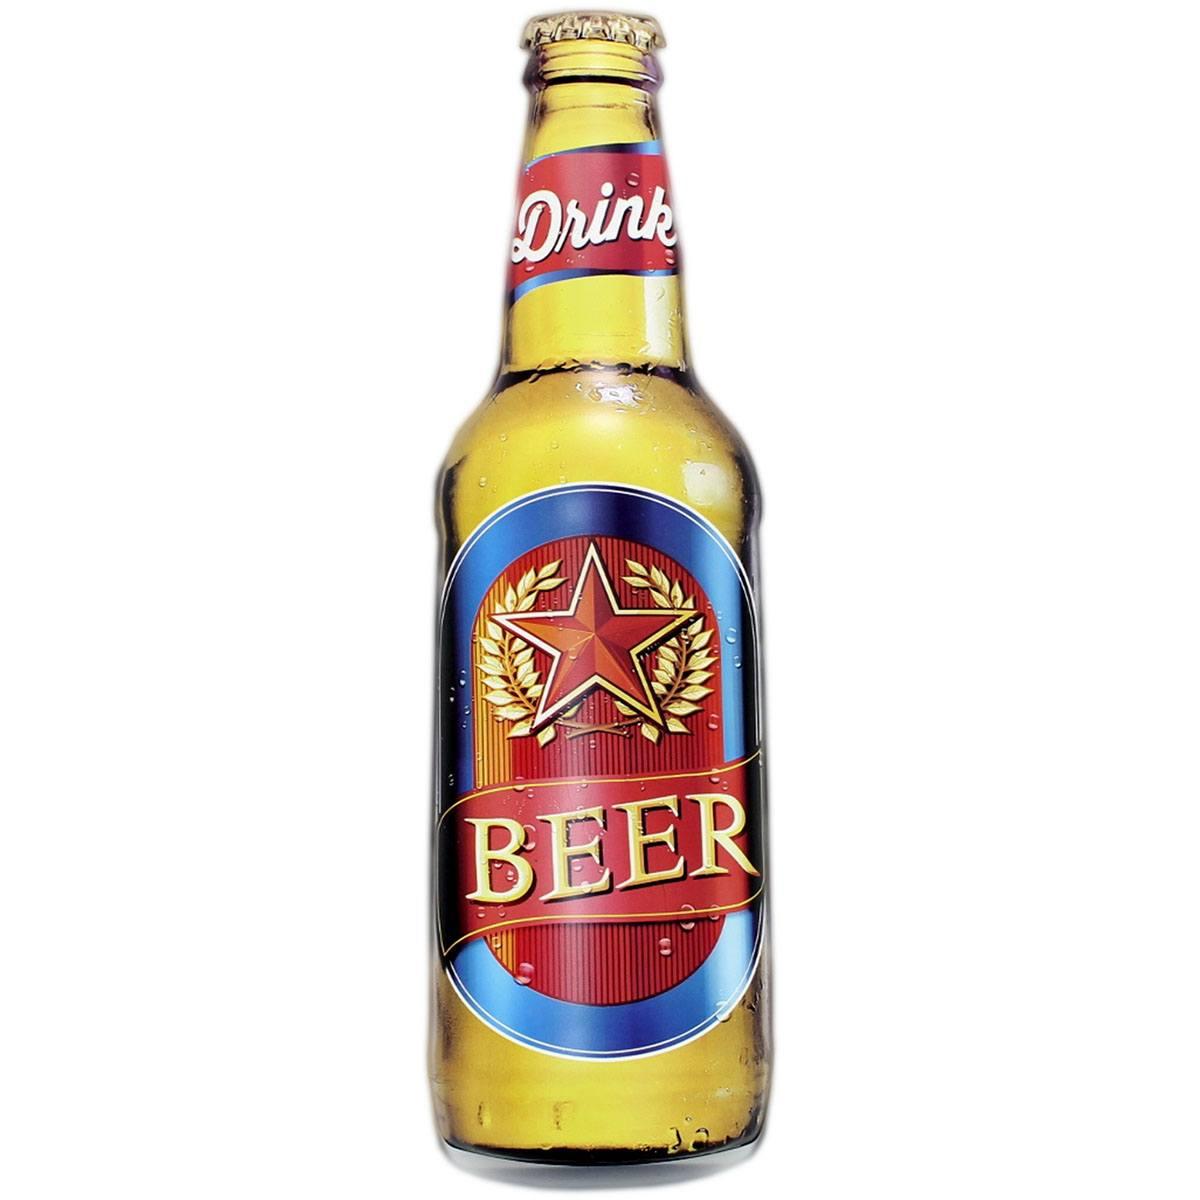 Placa Decorativa Metal Em Relevo Garrafa Beer Estrela 45x13 Cm